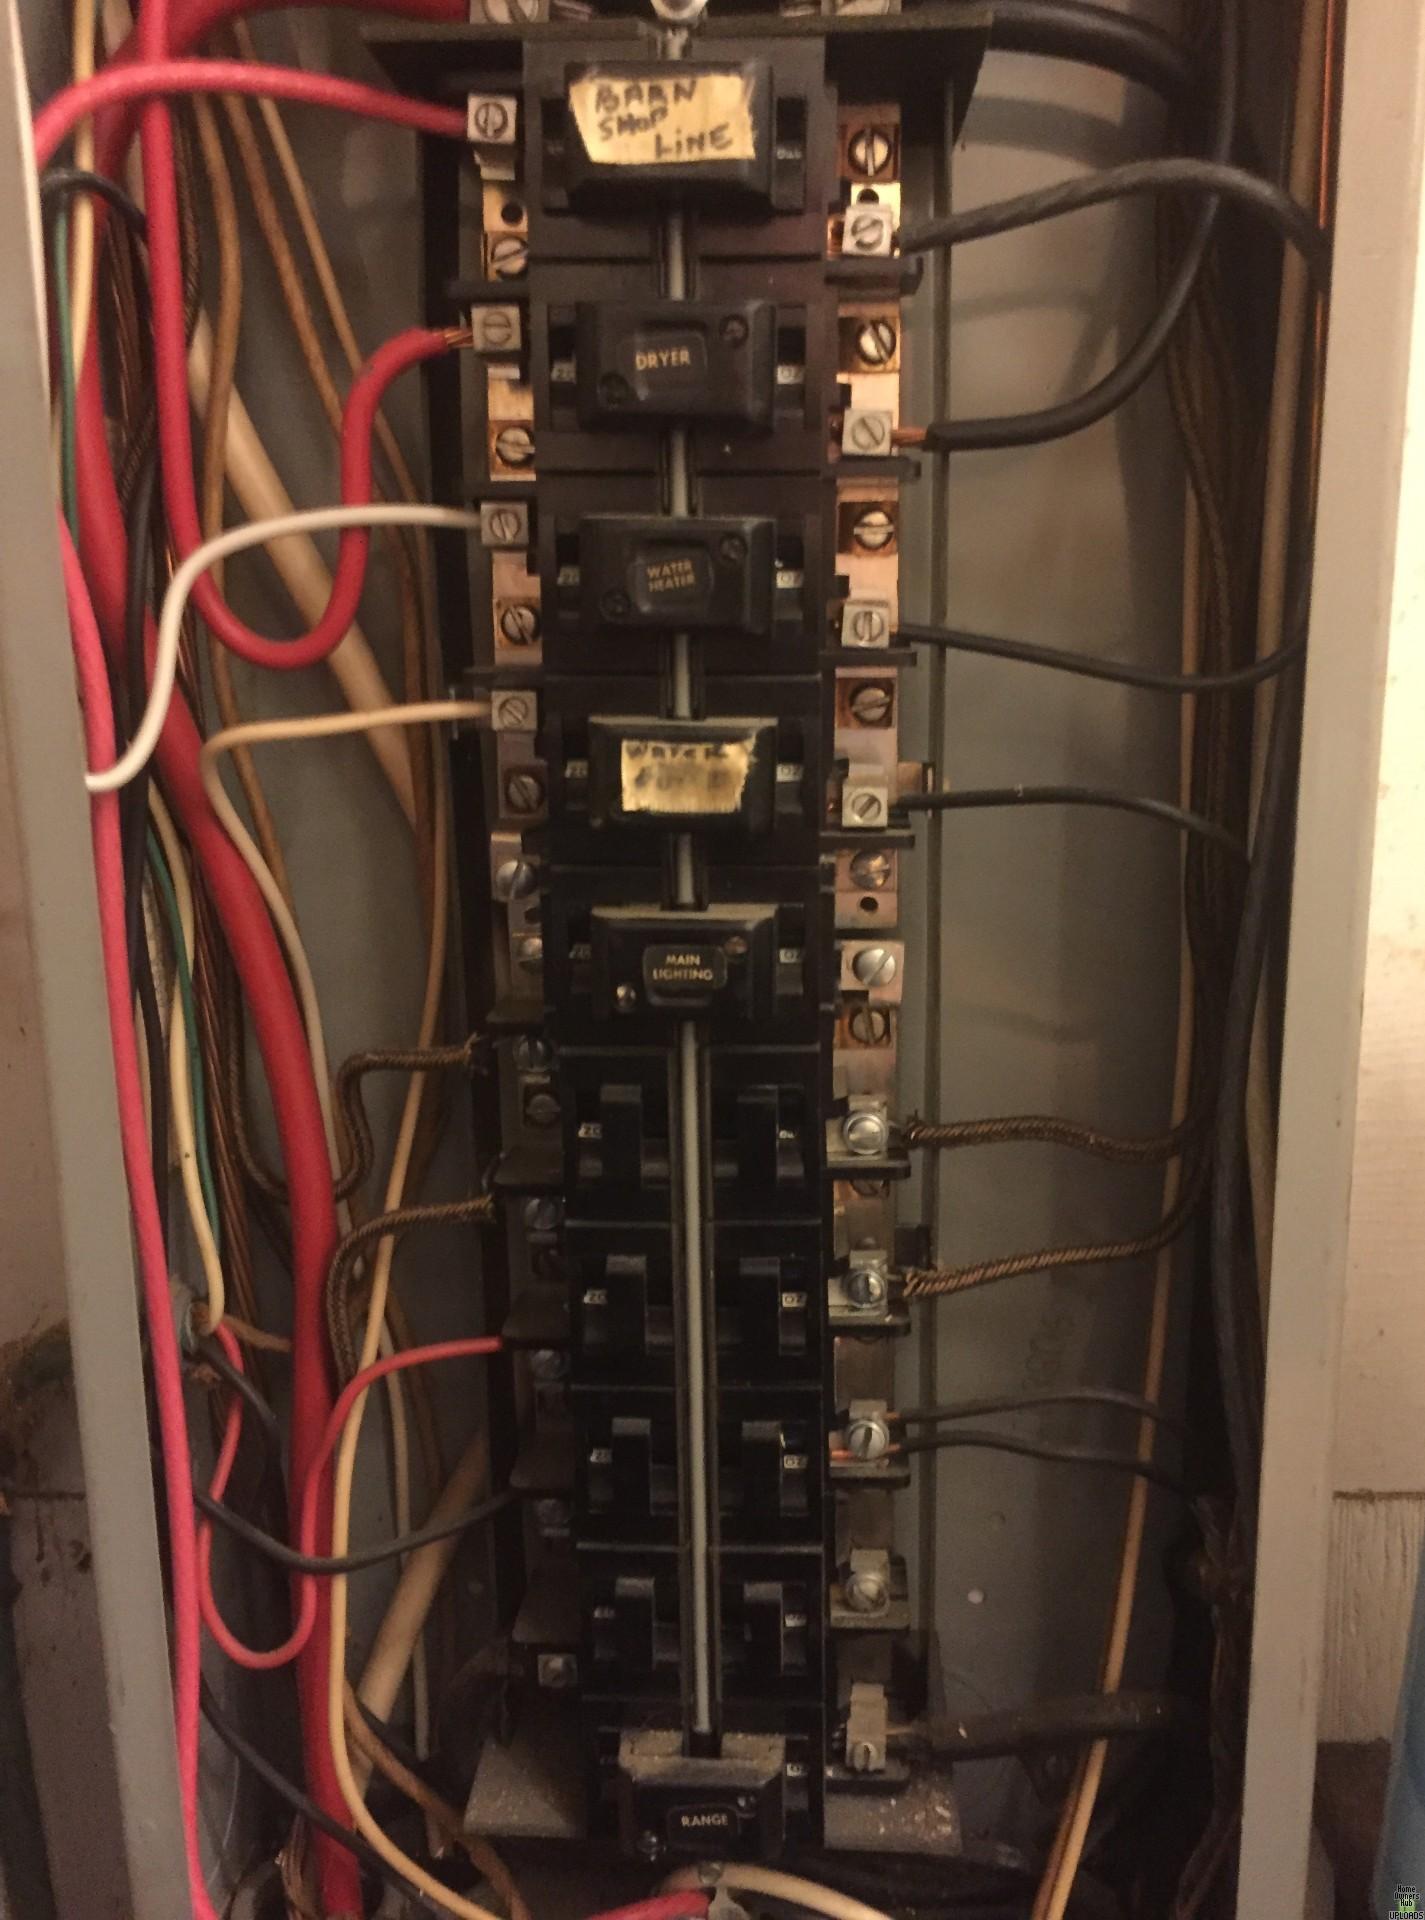 Pushmatic 200 Amp Fuse Box Wiring Diagrams Regular A Regular A Miglioribanche It